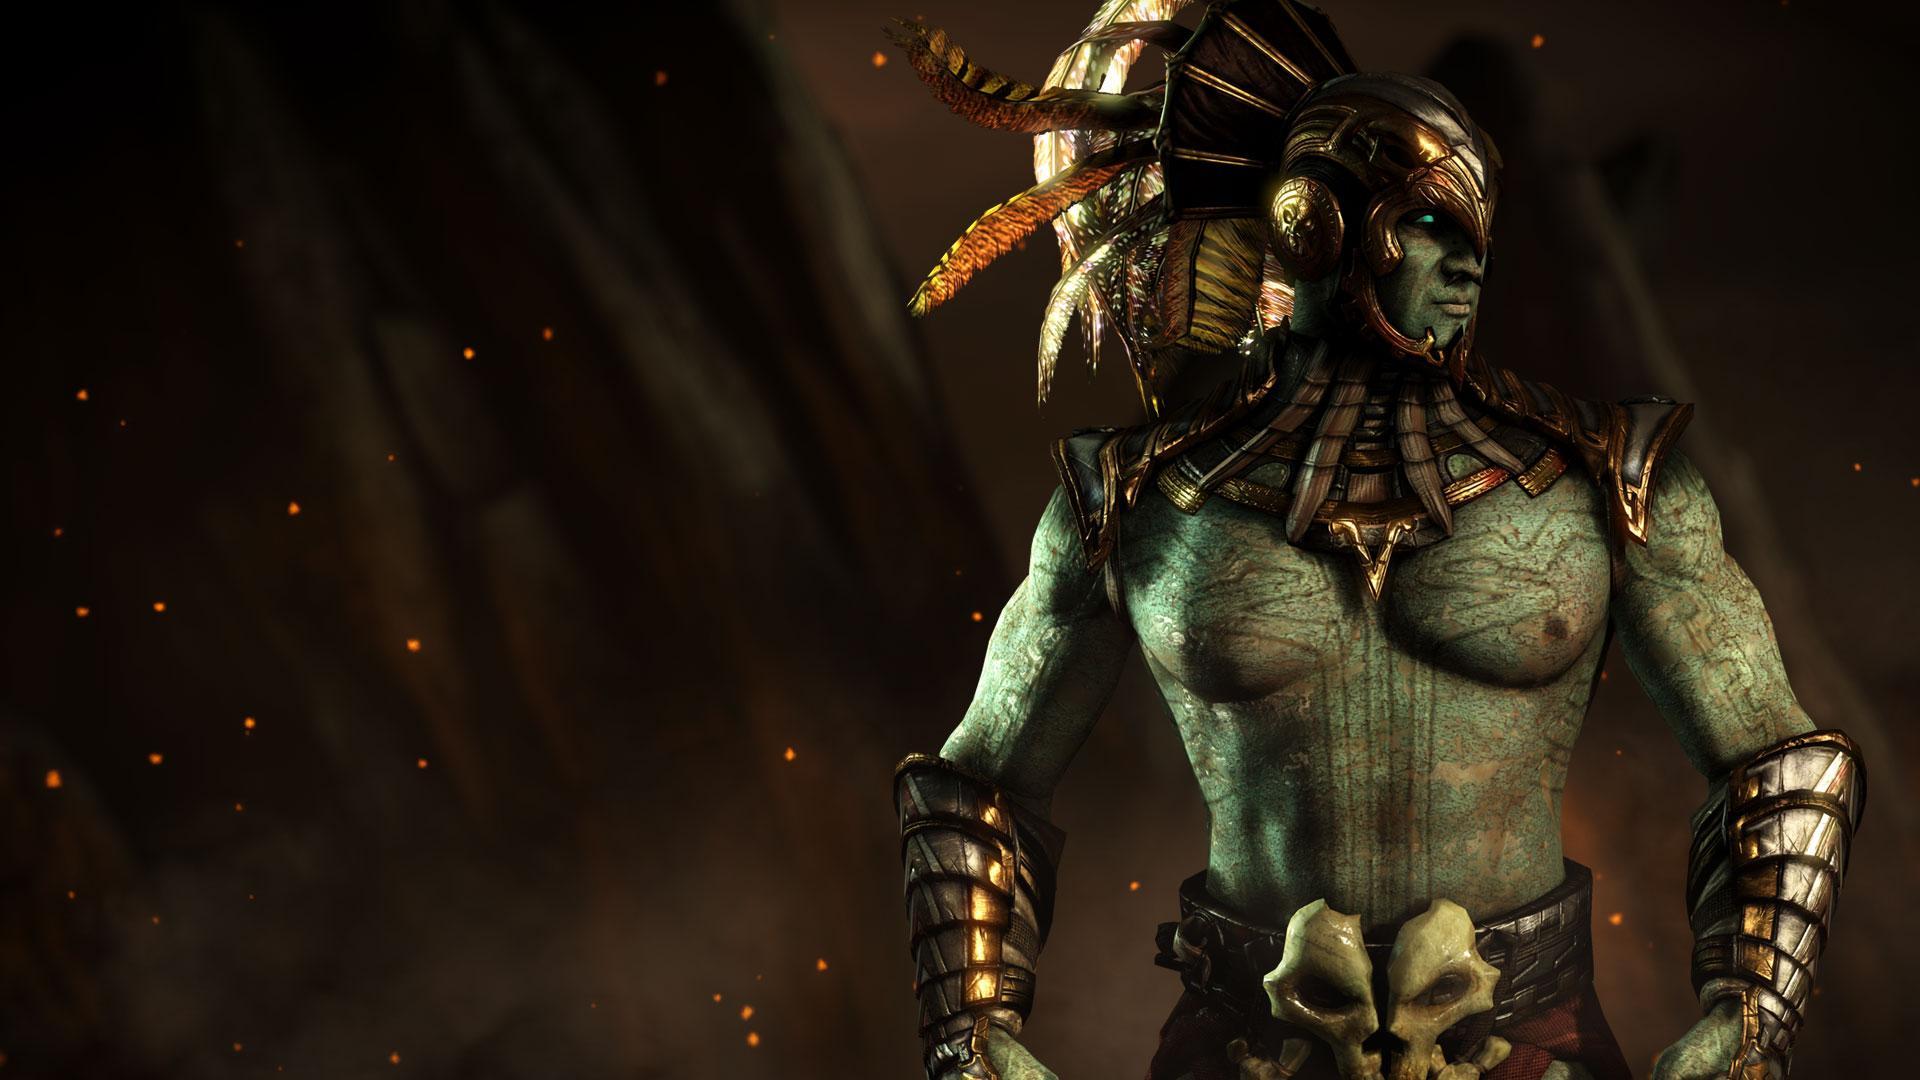 Mortal Kombat X - Xbox 360